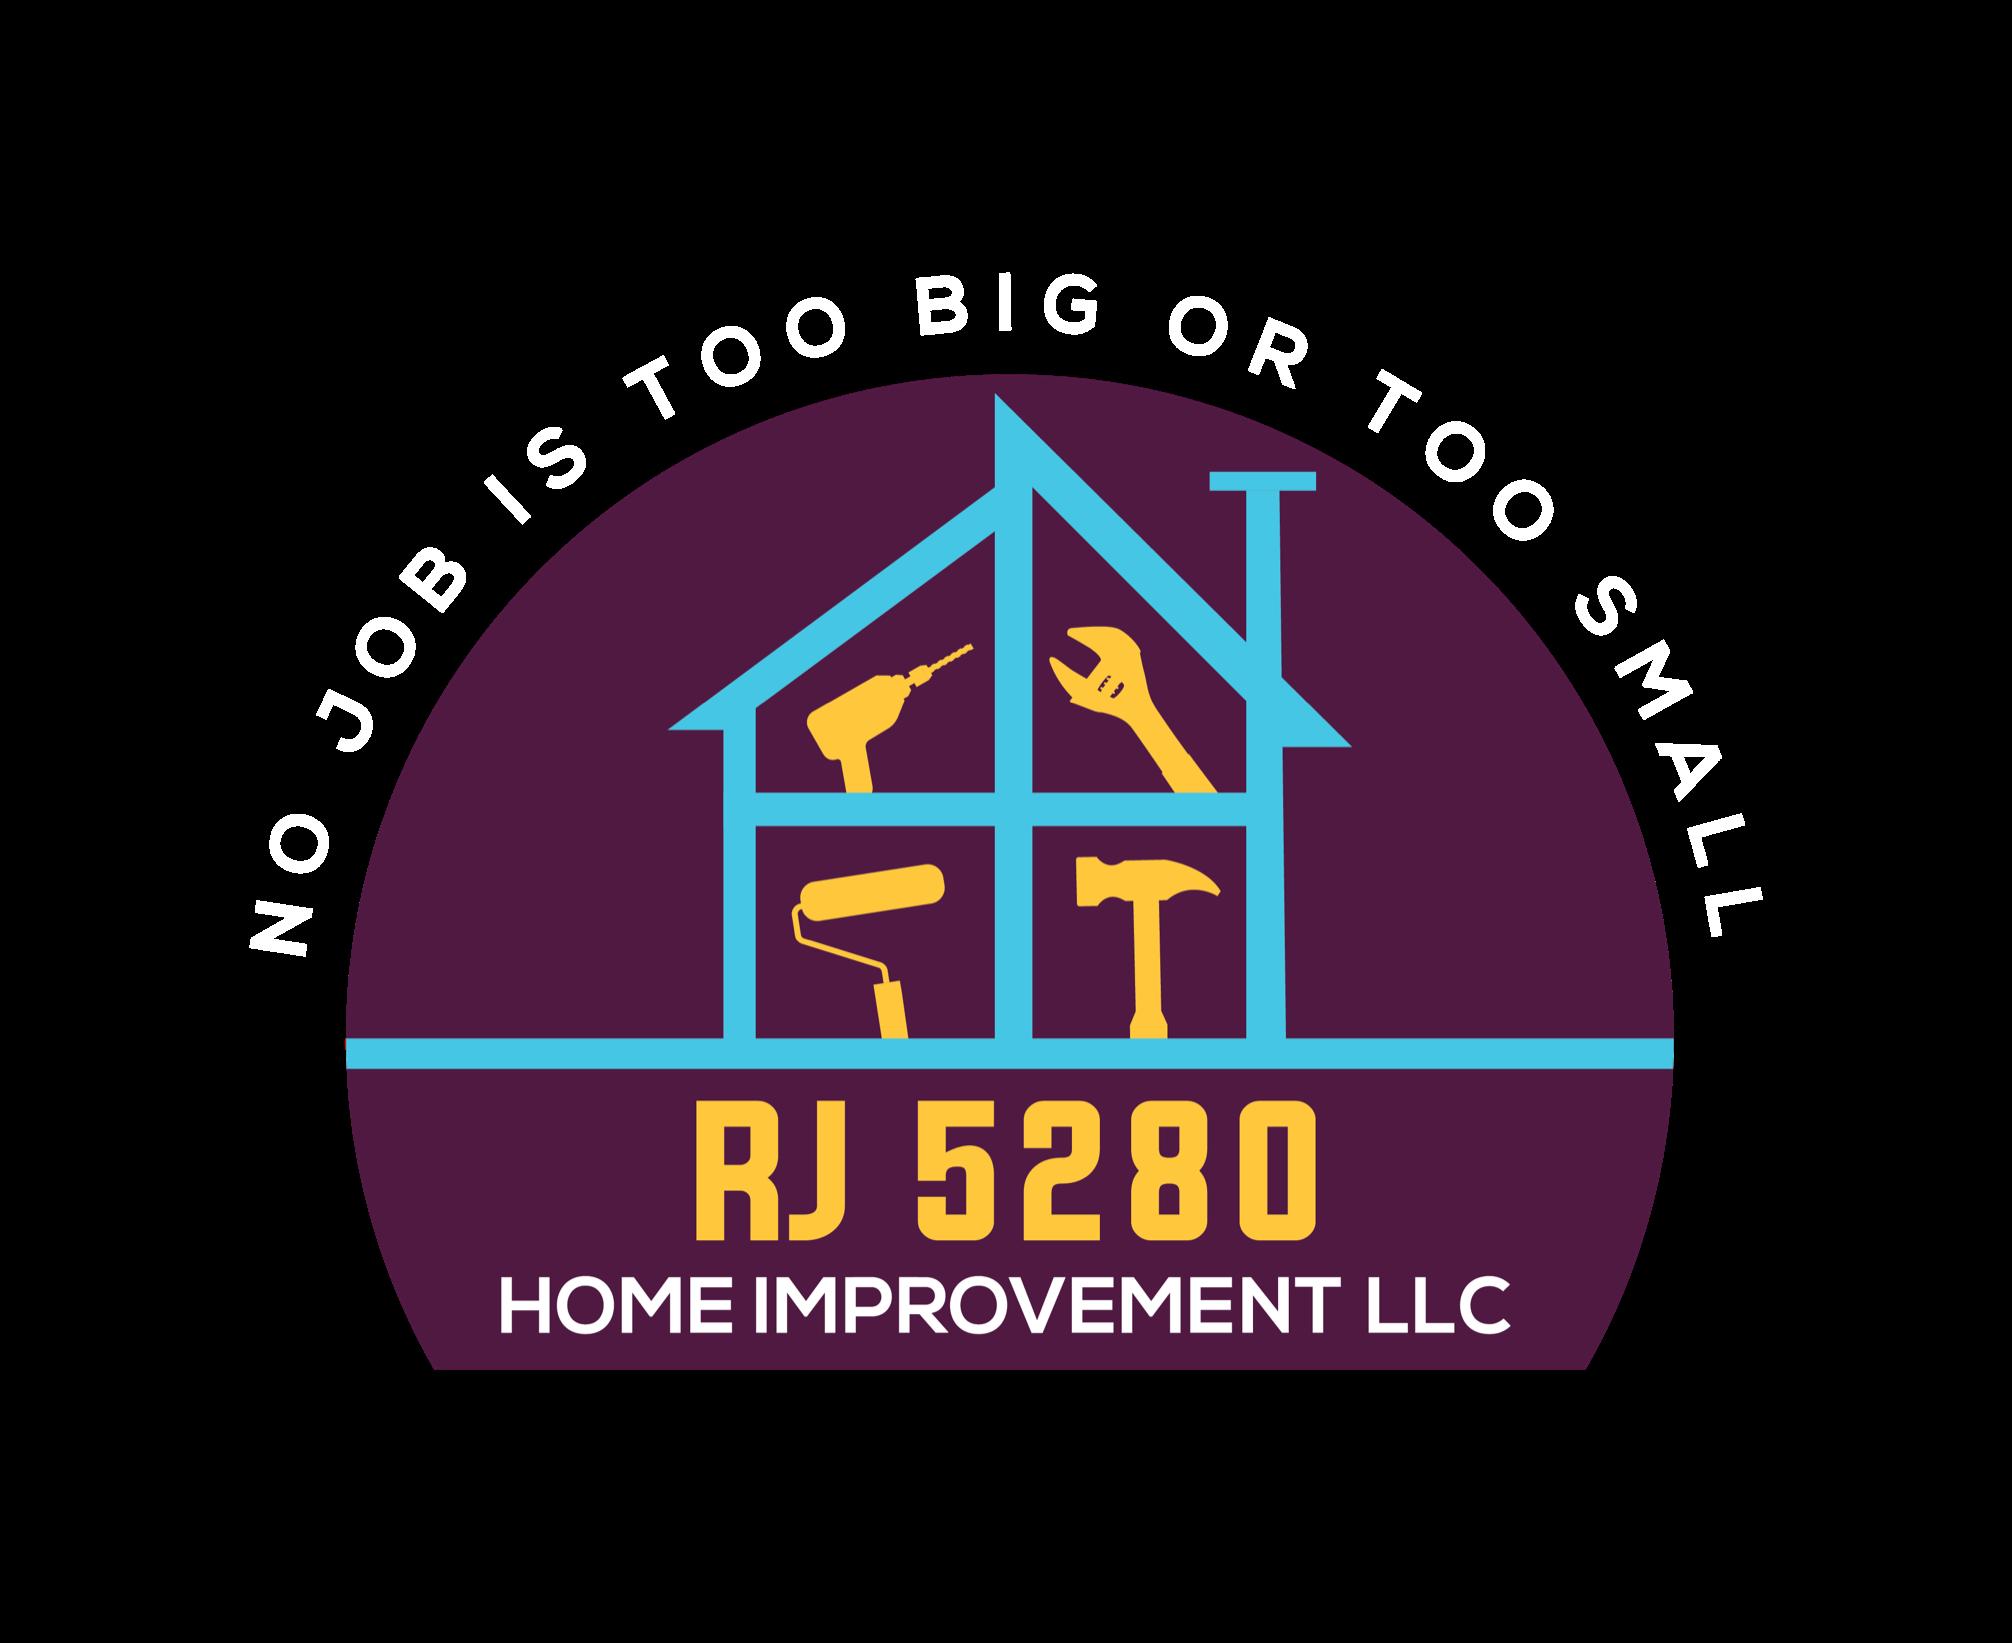 Rj 5280 Home Improvement